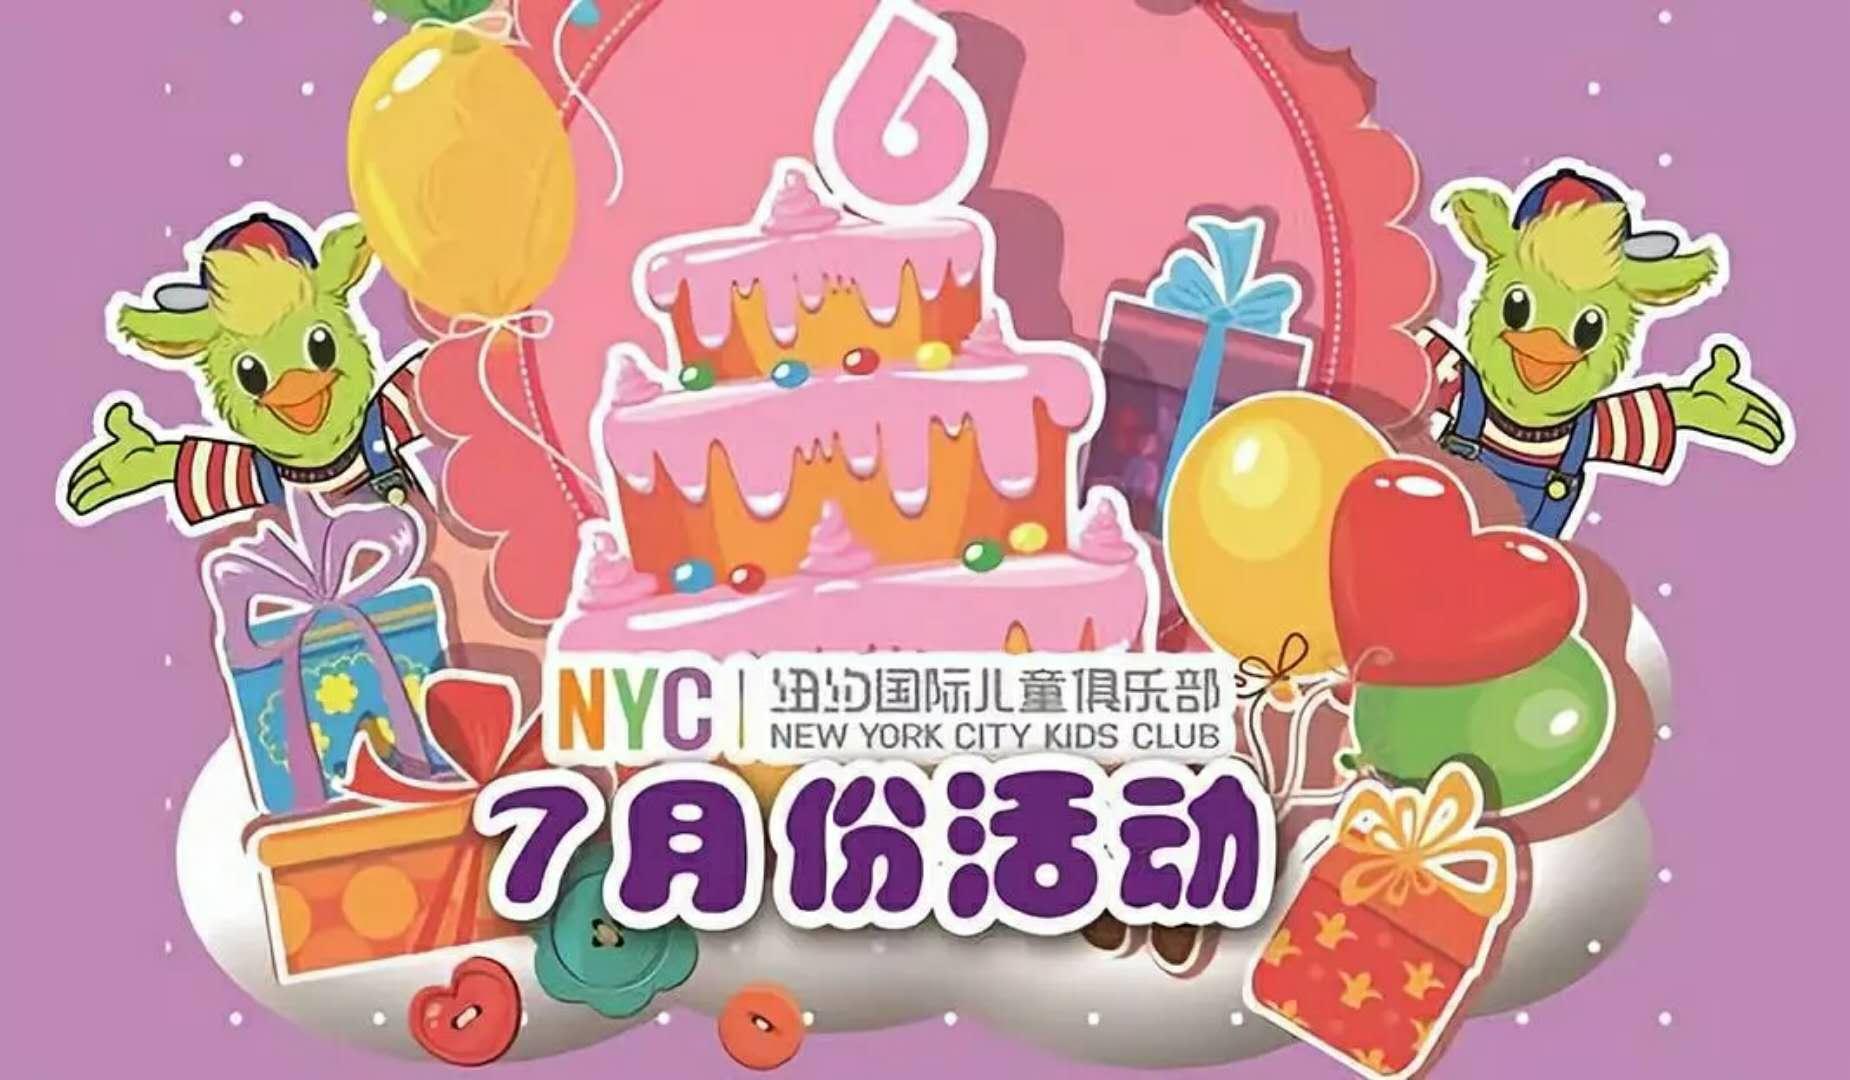 NYC西安曲江早教中心:主题生日会